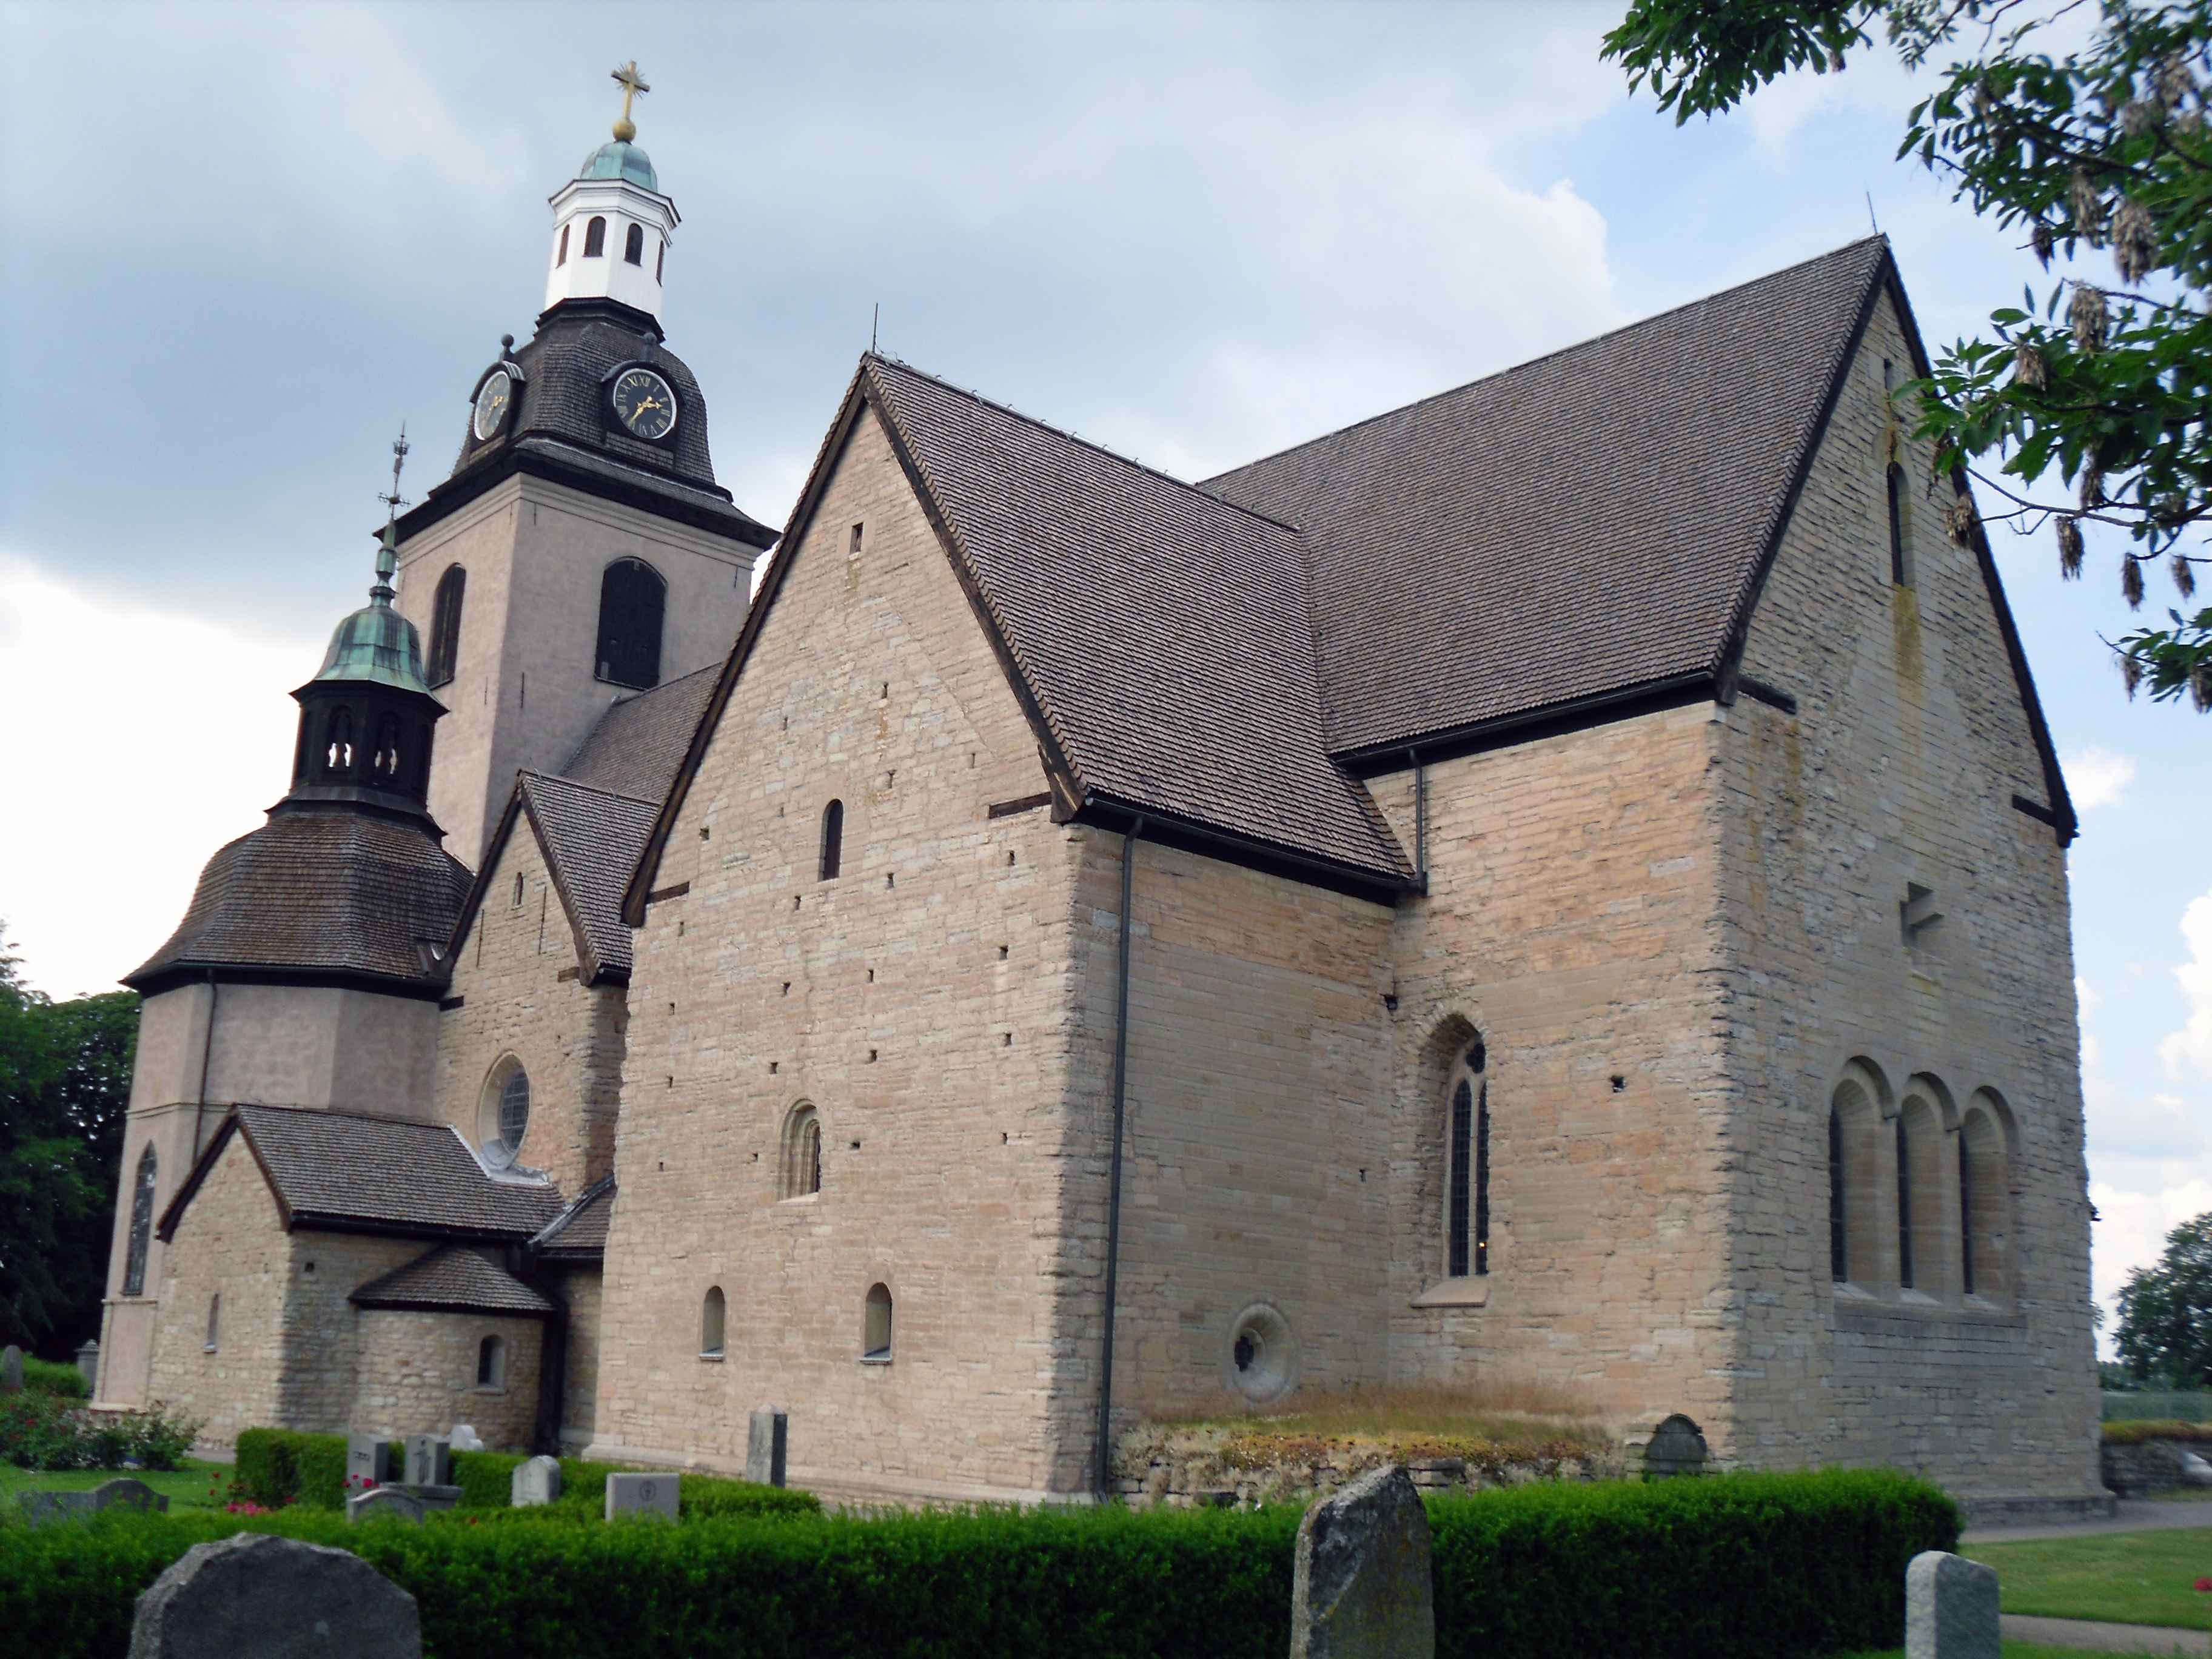 Kornettgardens Samlingar och Cafe (Vreta Kloster) - TripAdvisor